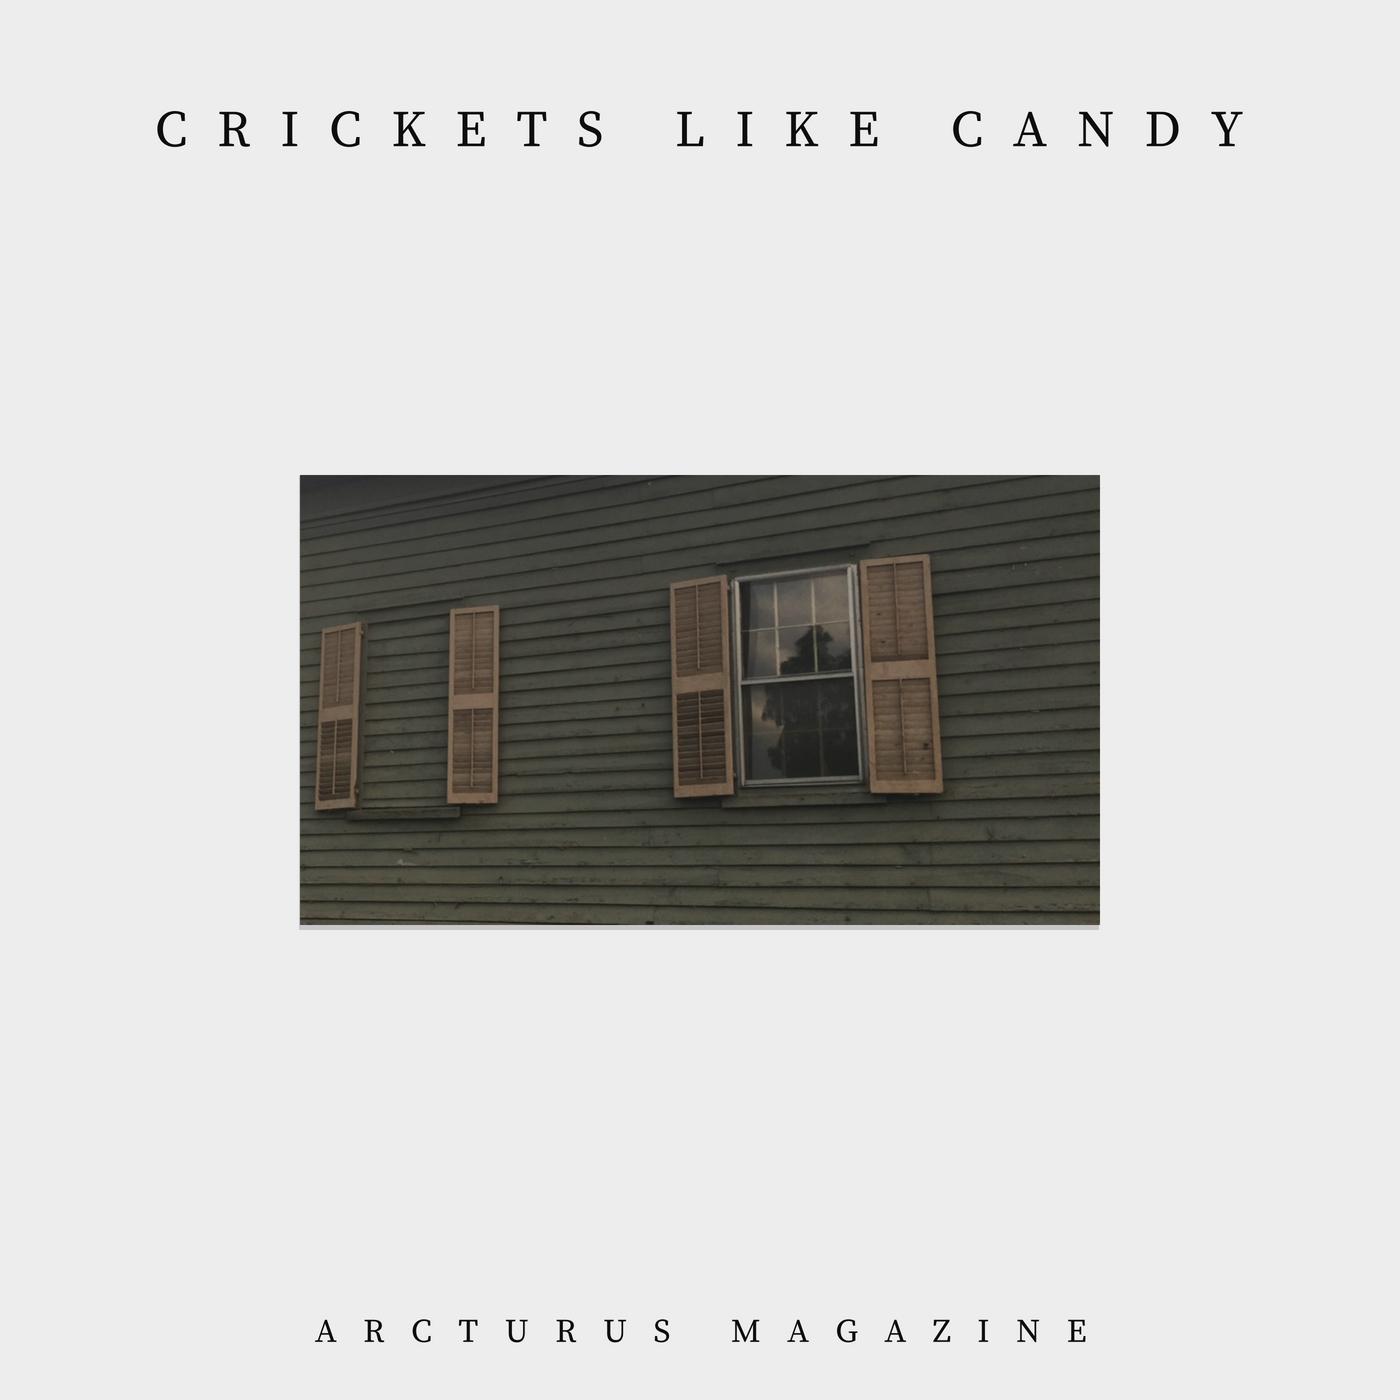 Crickets Like Candy